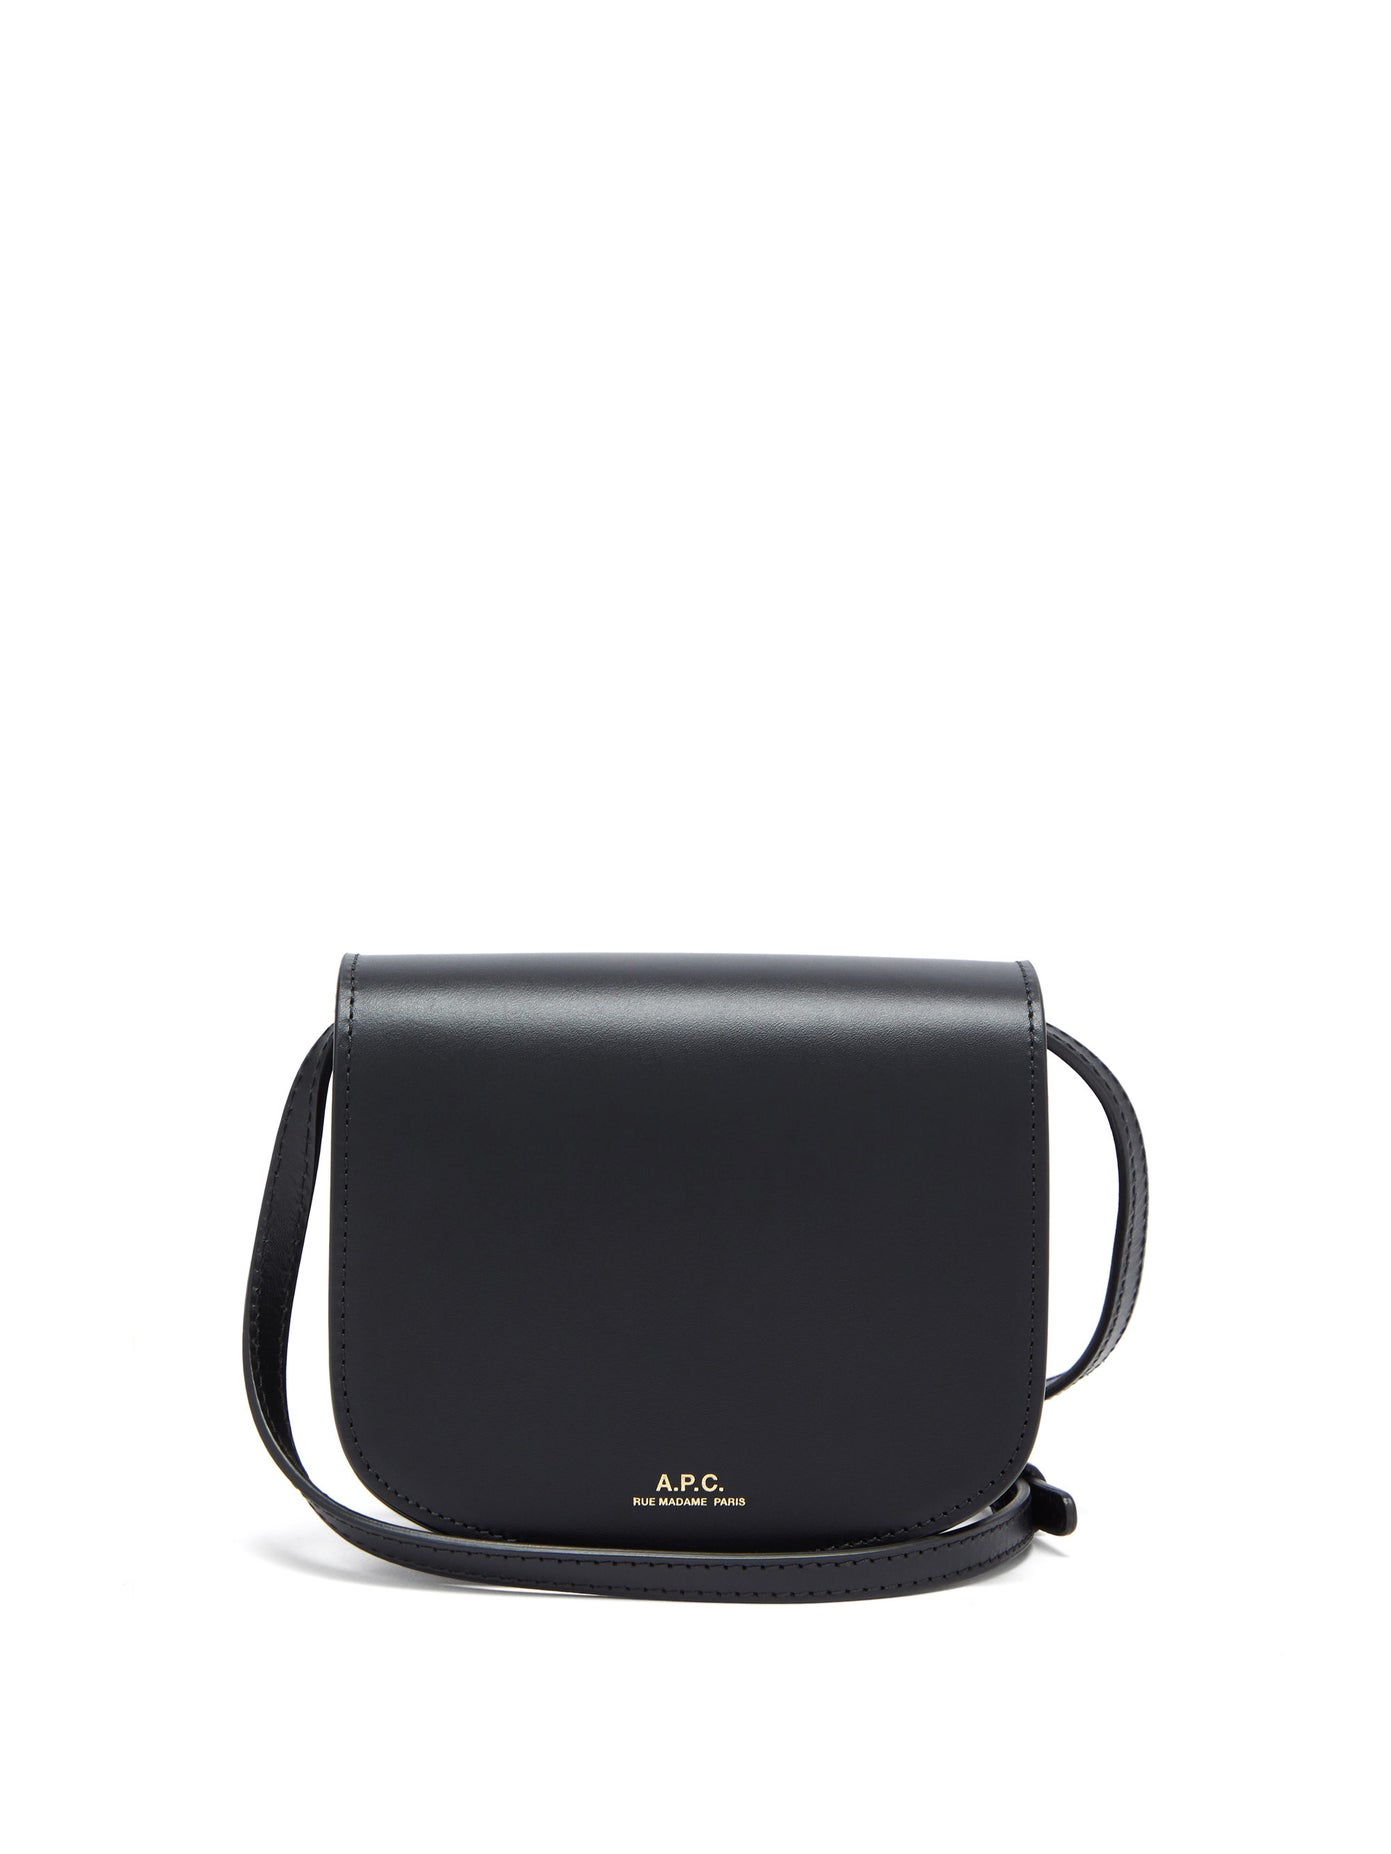 A.P.C., Dina mini smooth-leather cross-body bag, 490лв